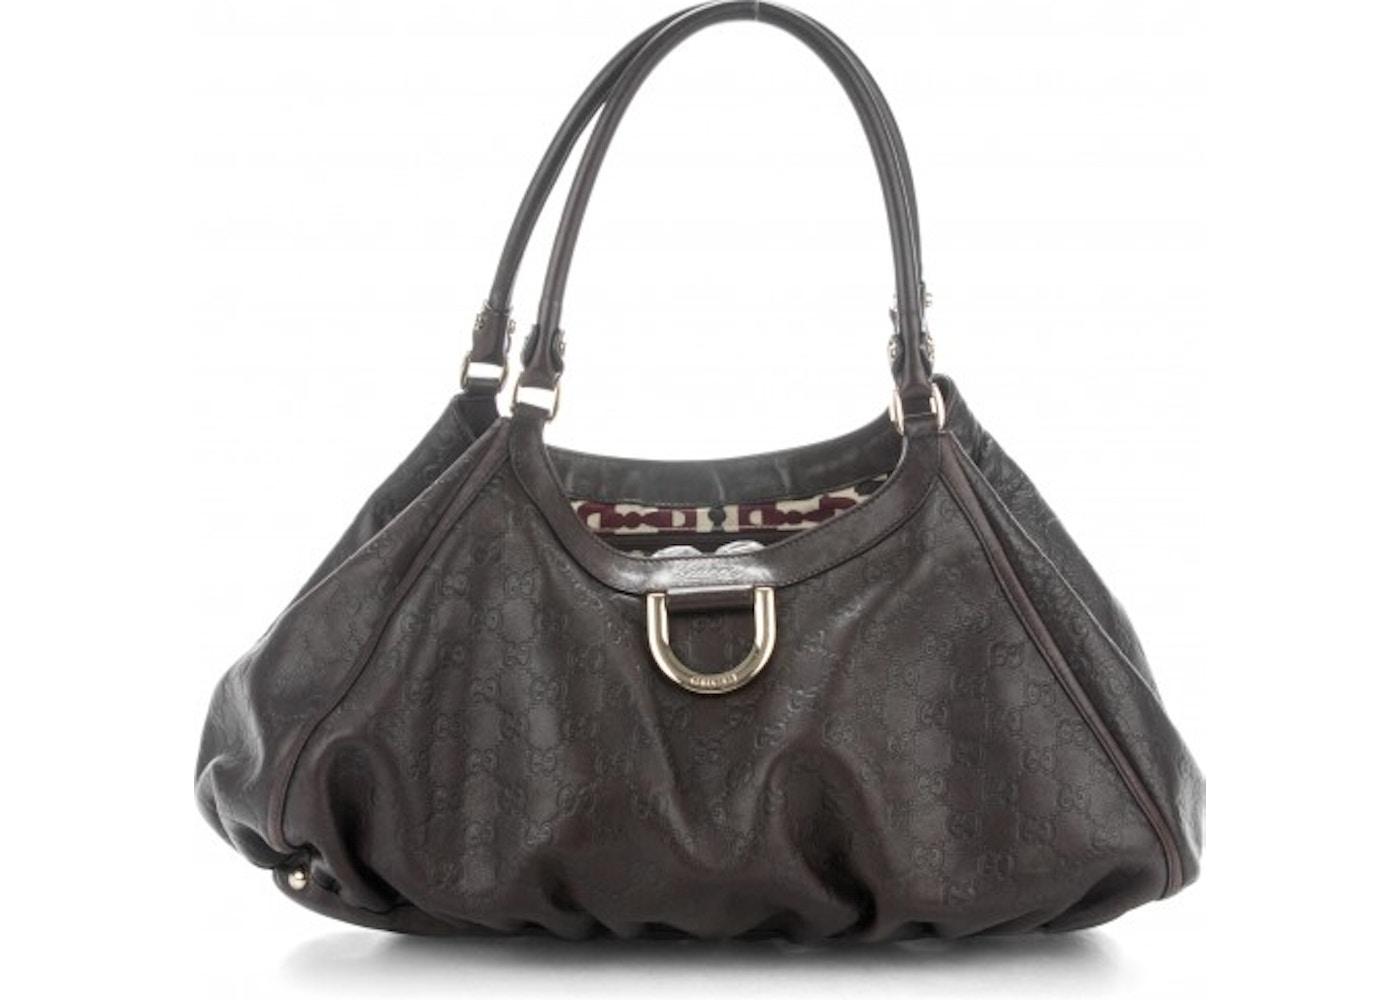 e85c6fc669c Gucci D Gold Shoulder Bag Monogram Guccissima Large Chocolate Brown.  Monogram Guccissima Large Chocolate Brown